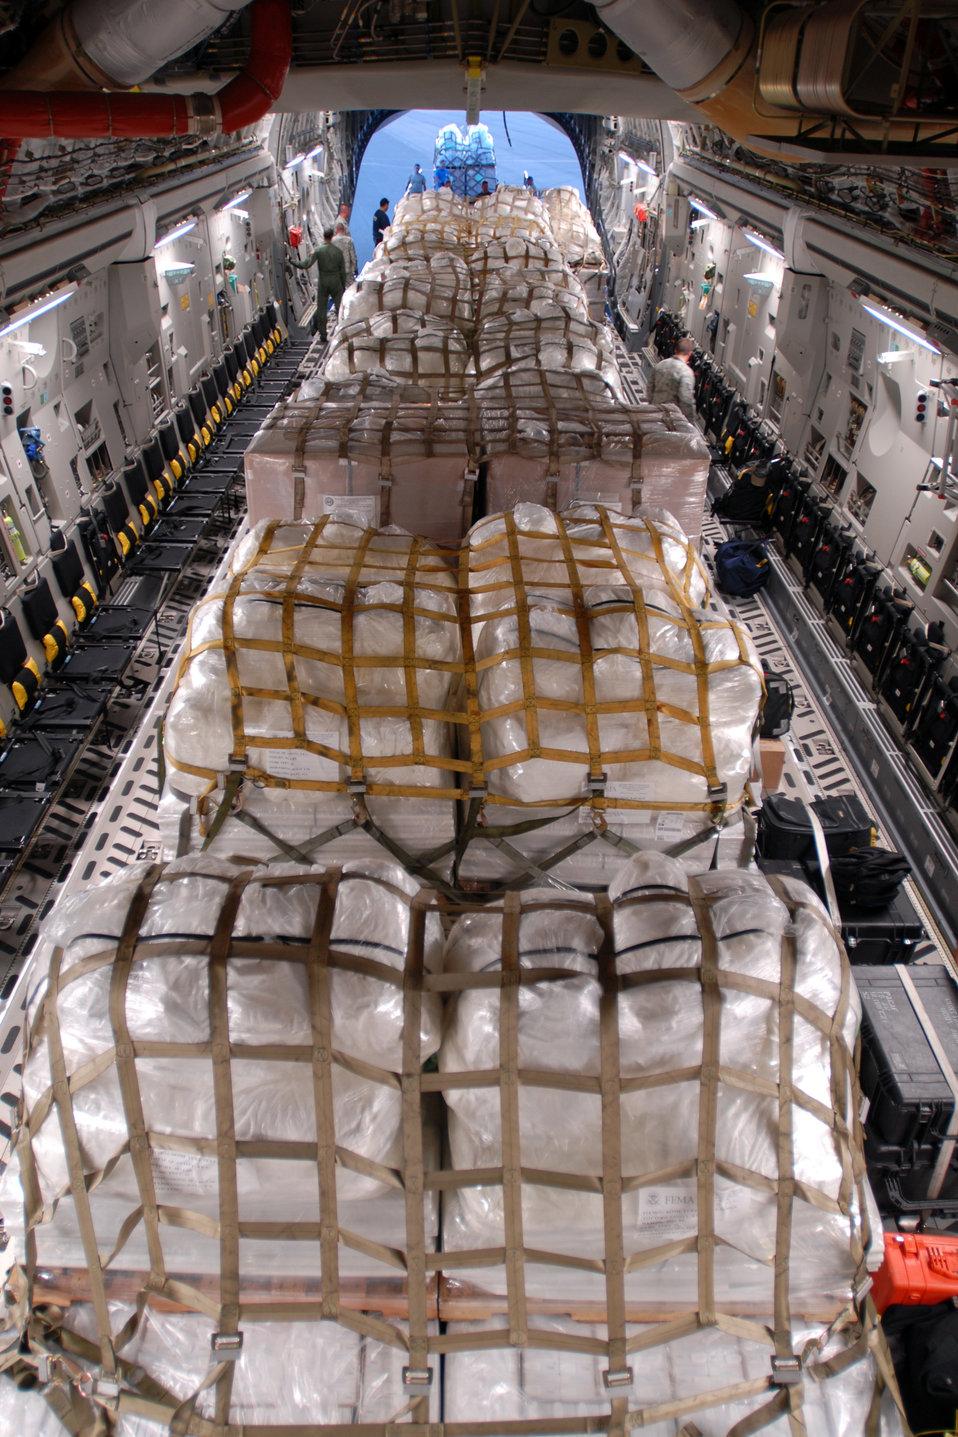 Humanitarian aid bound for tsunami relief effort